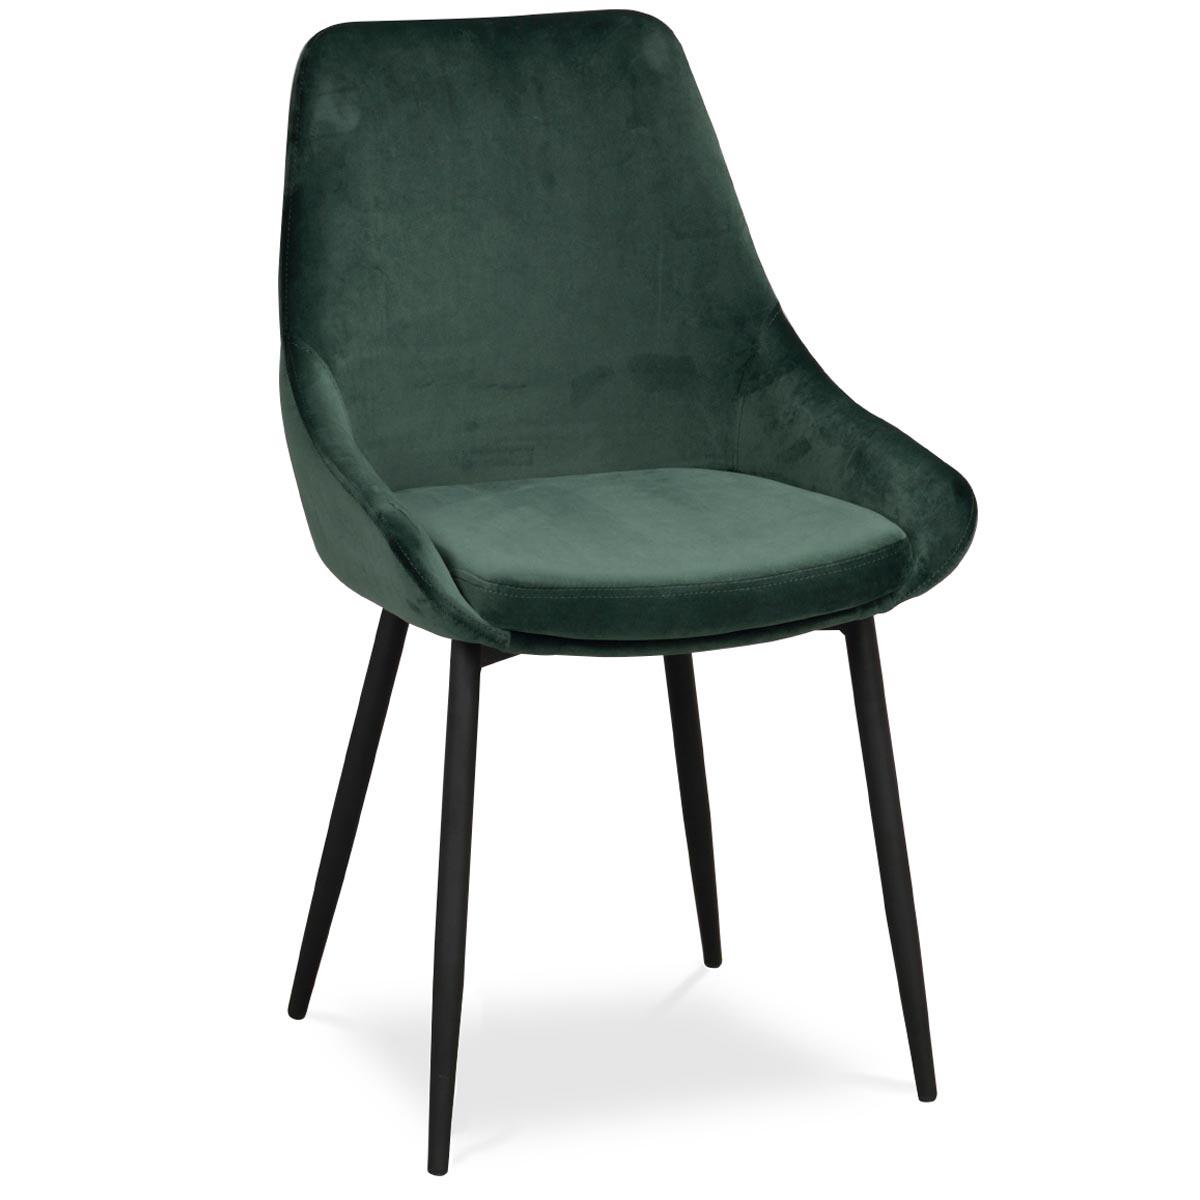 Ebbot stol sammet grön